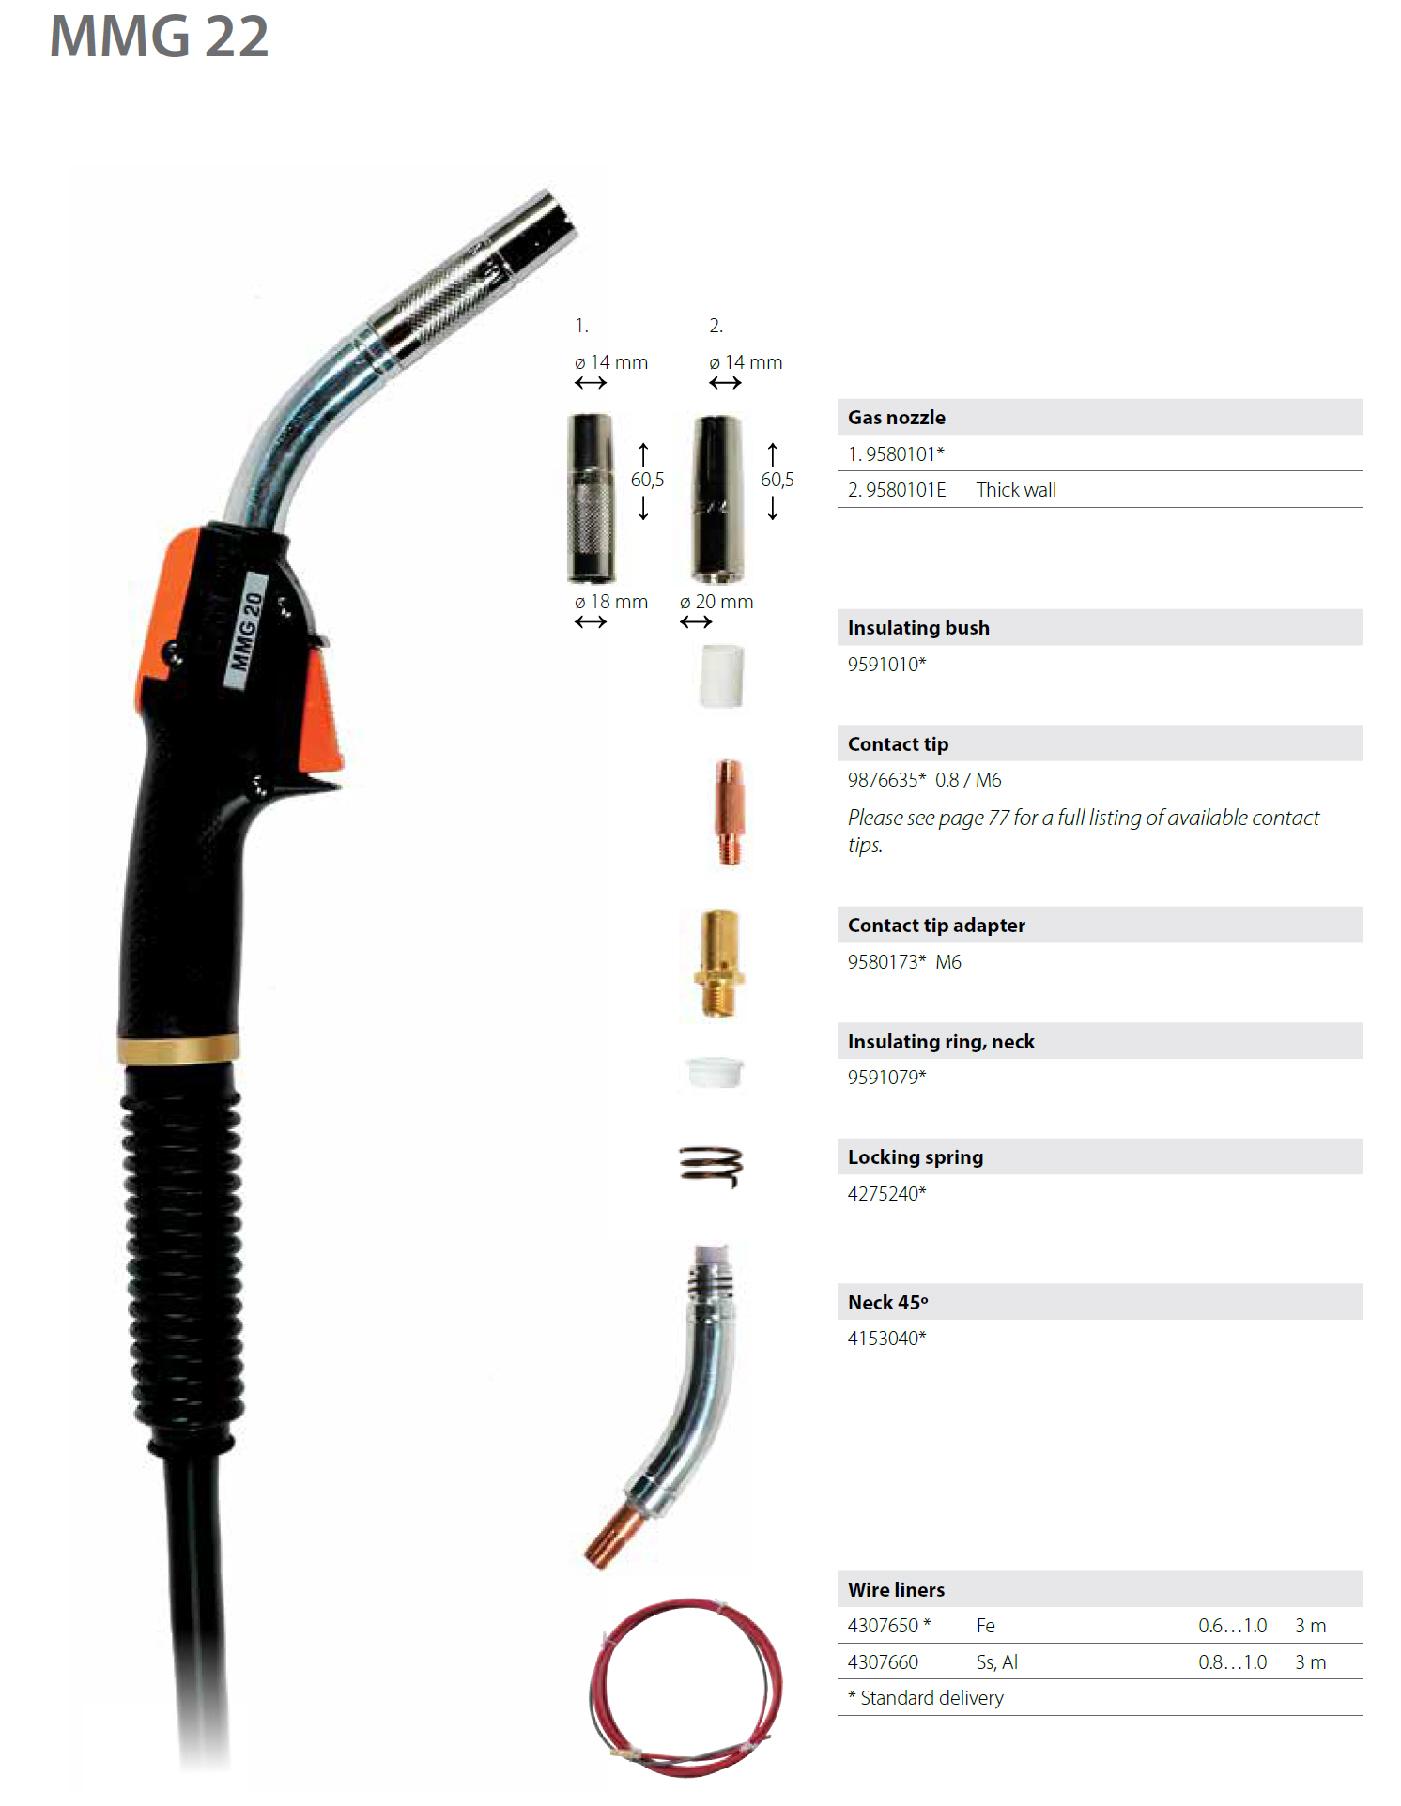 Kemppi Miniarcmig Evo 170 200 Mig Torch Parts Mmg 22